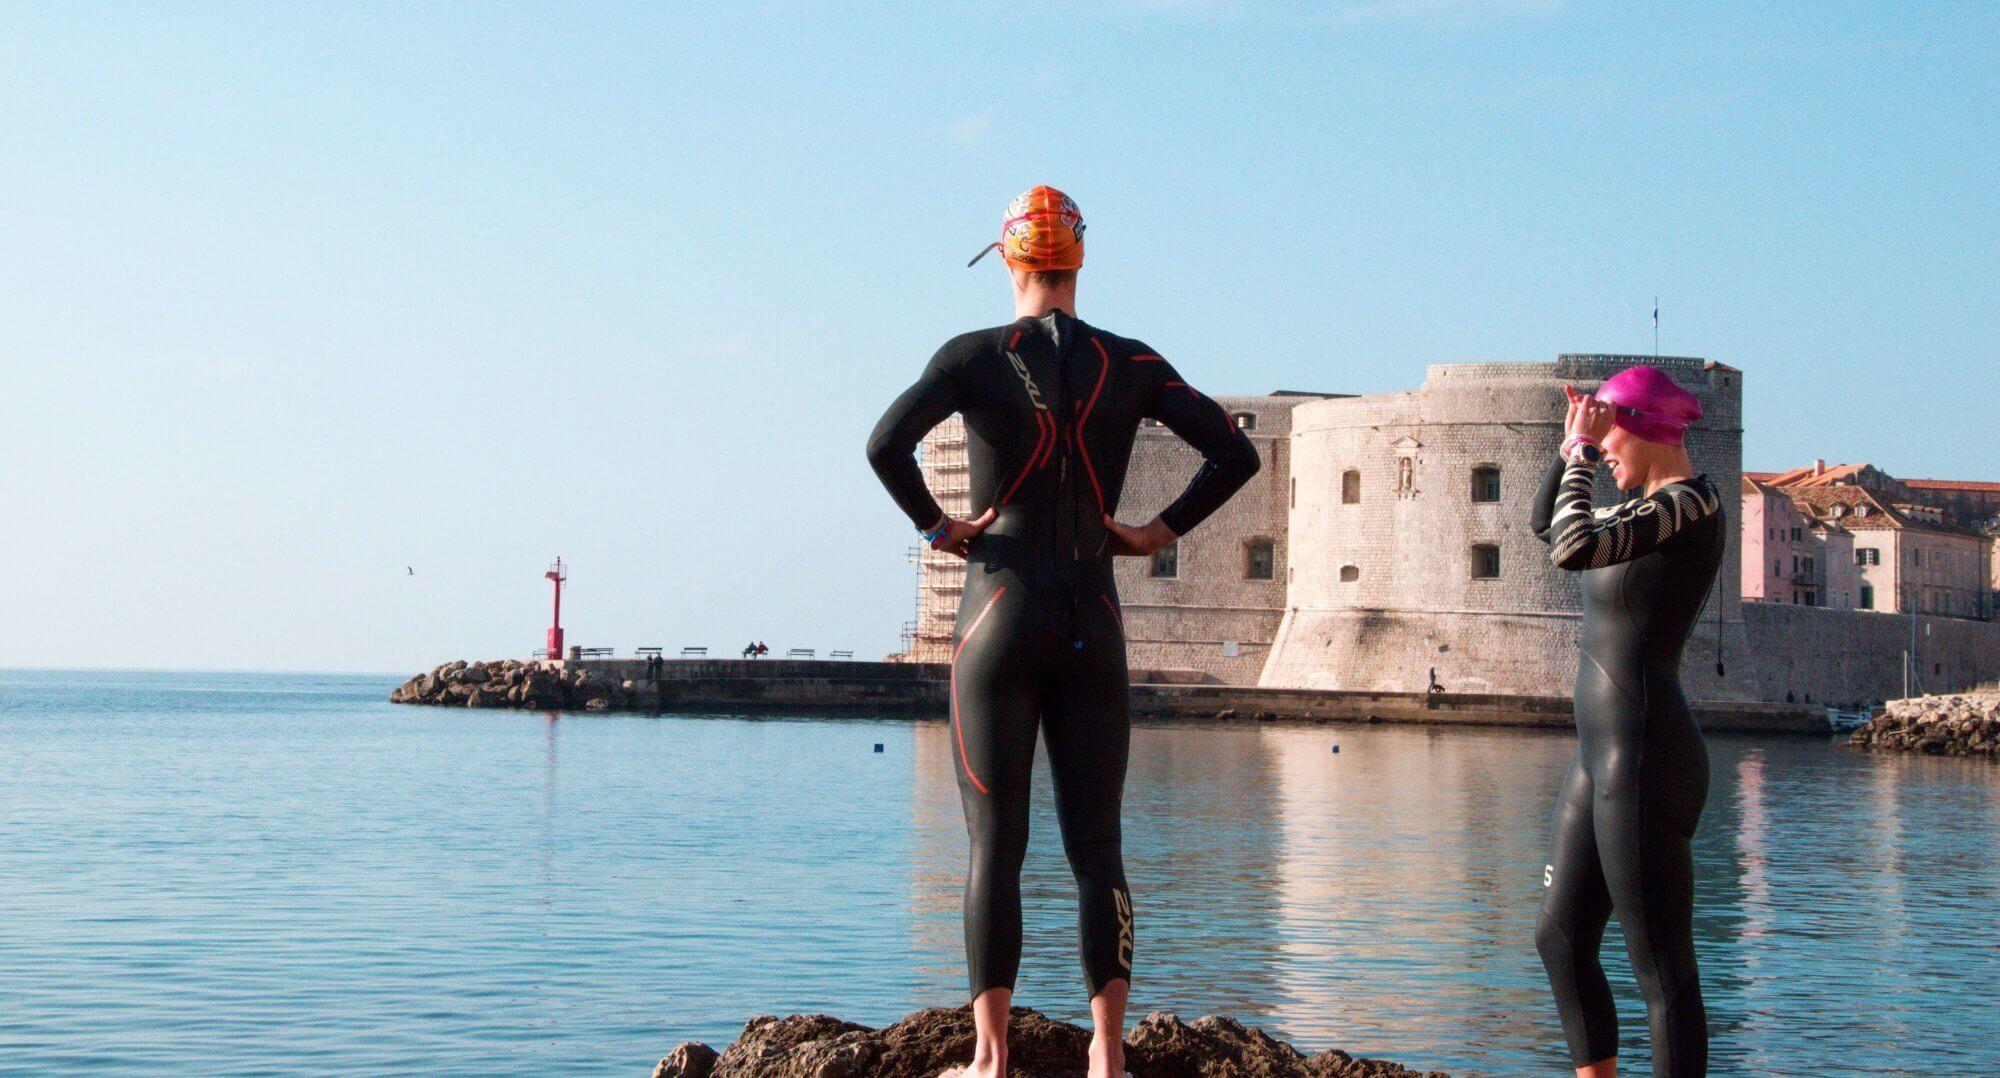 Triathlete in Dubrovnik Old Port